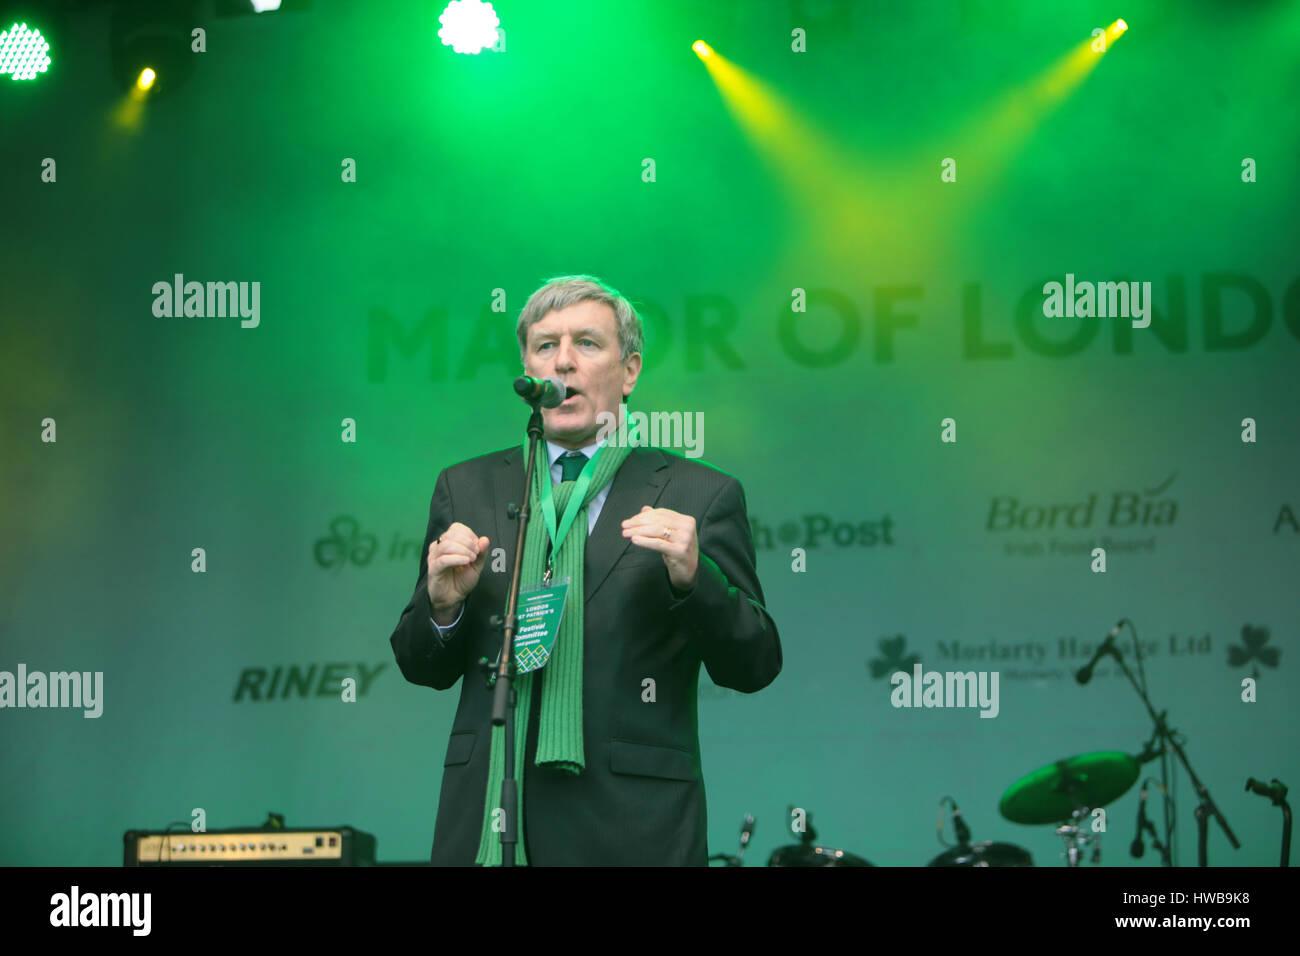 London 19 March 2017 Dan Mulhall, Ambassador of Ireland to Great Britain since September 2013 speaking in Trafalgar Stock Photo